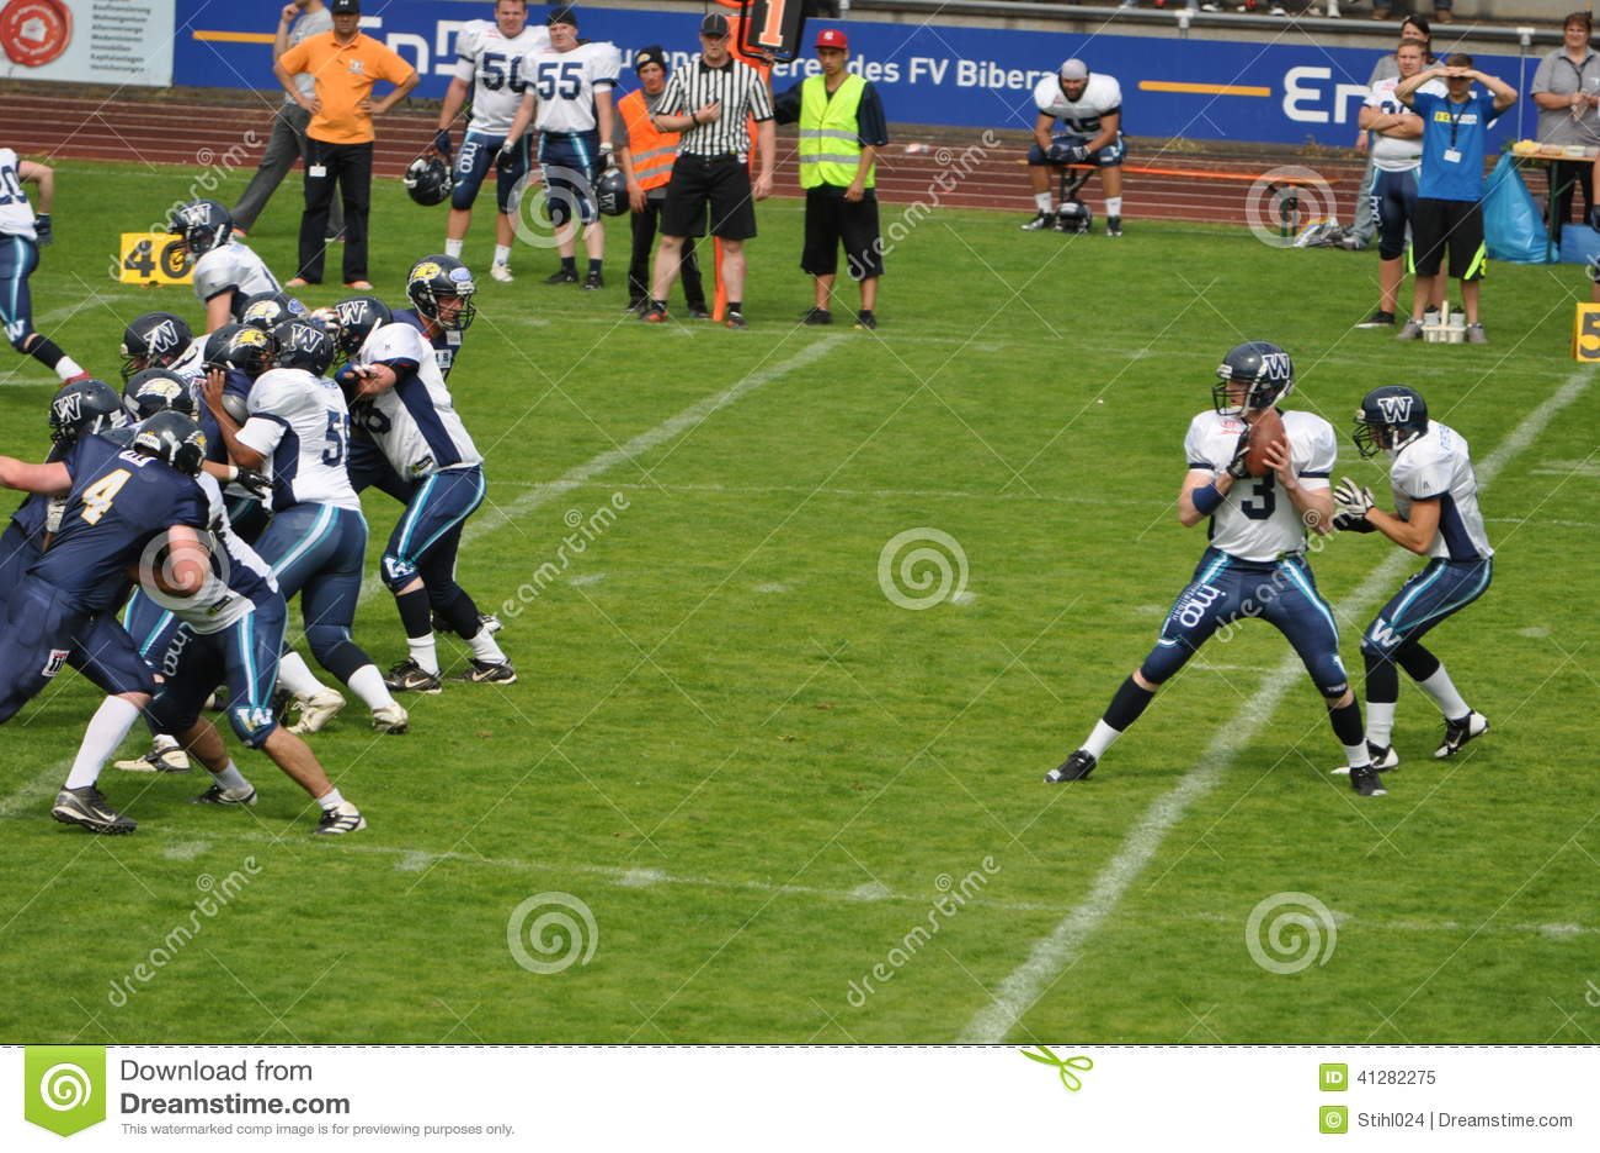 american football online game